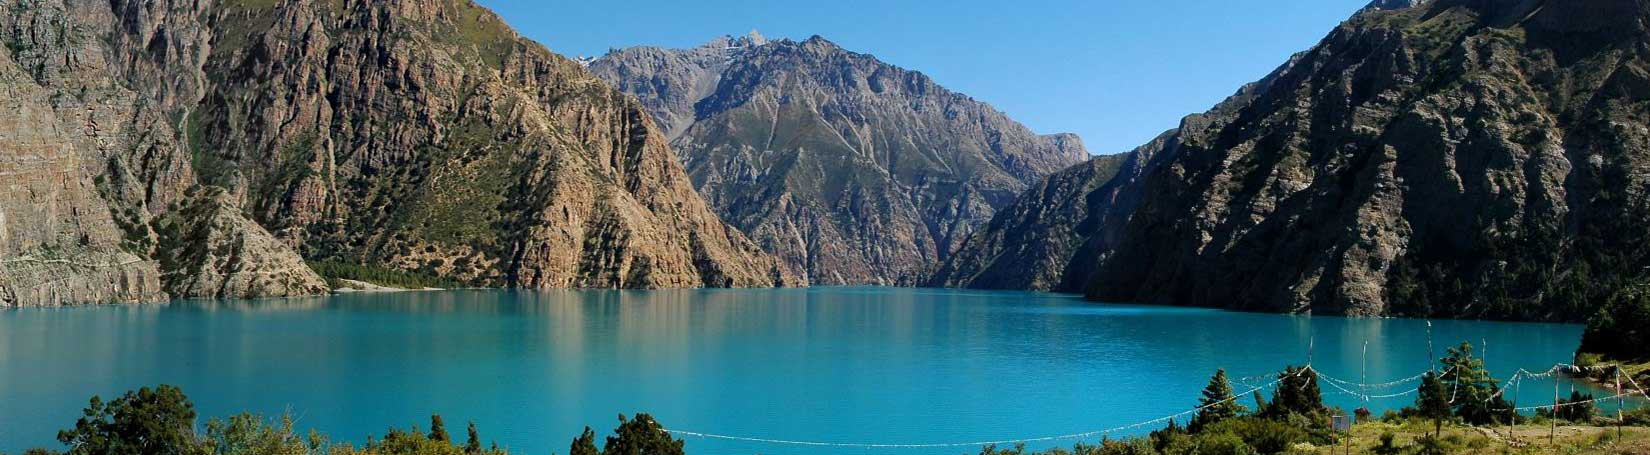 Shey Phoksundo Lake